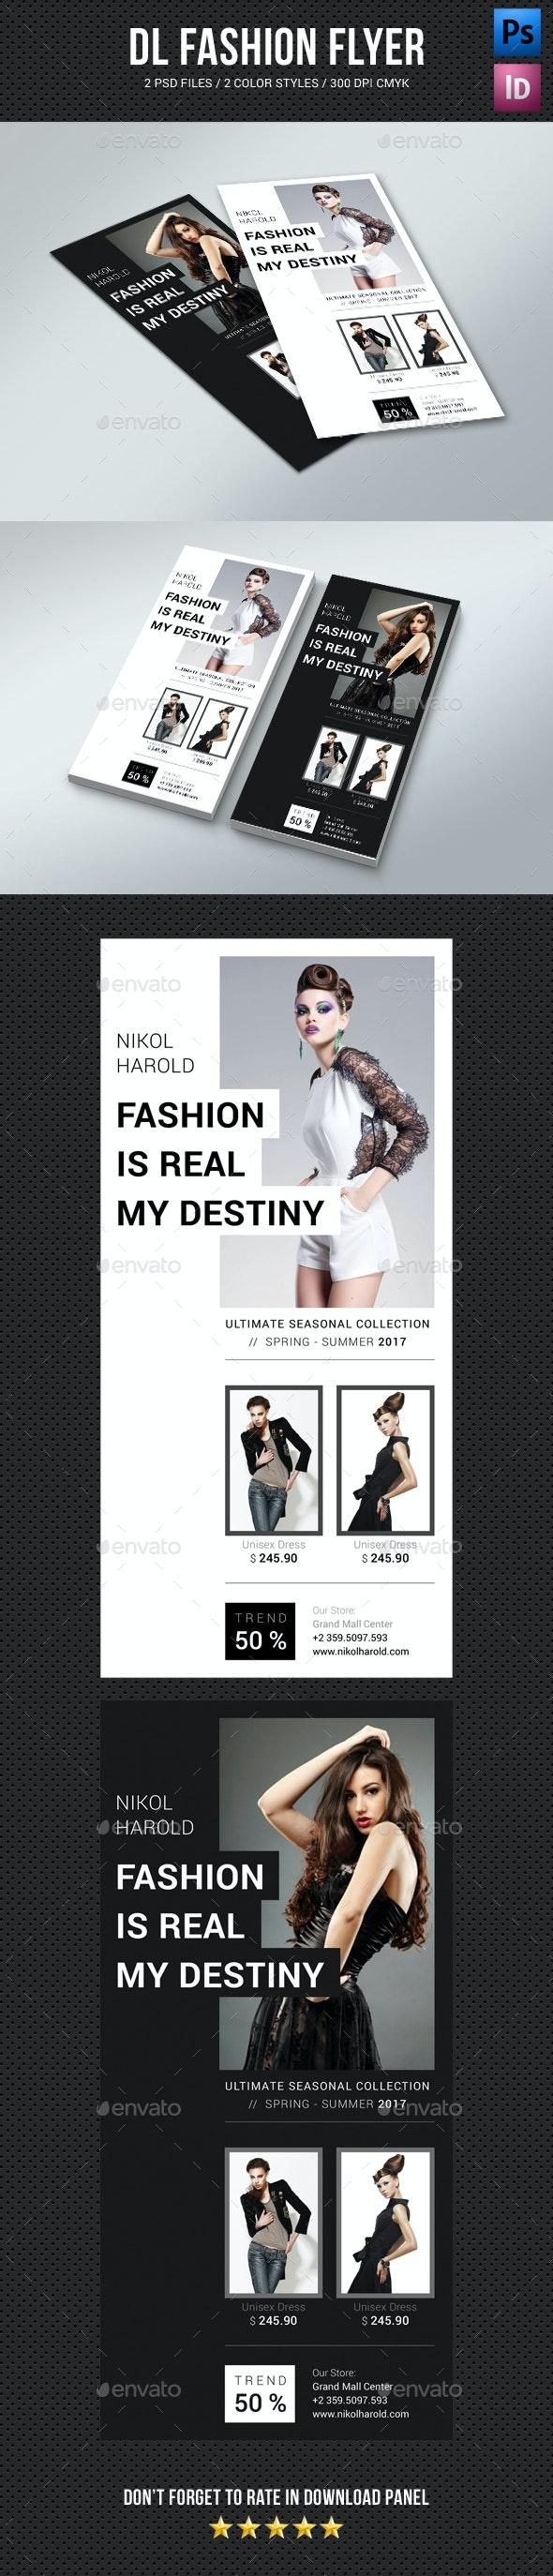 DL Fashion Flyer 02 - Commerce Flyers